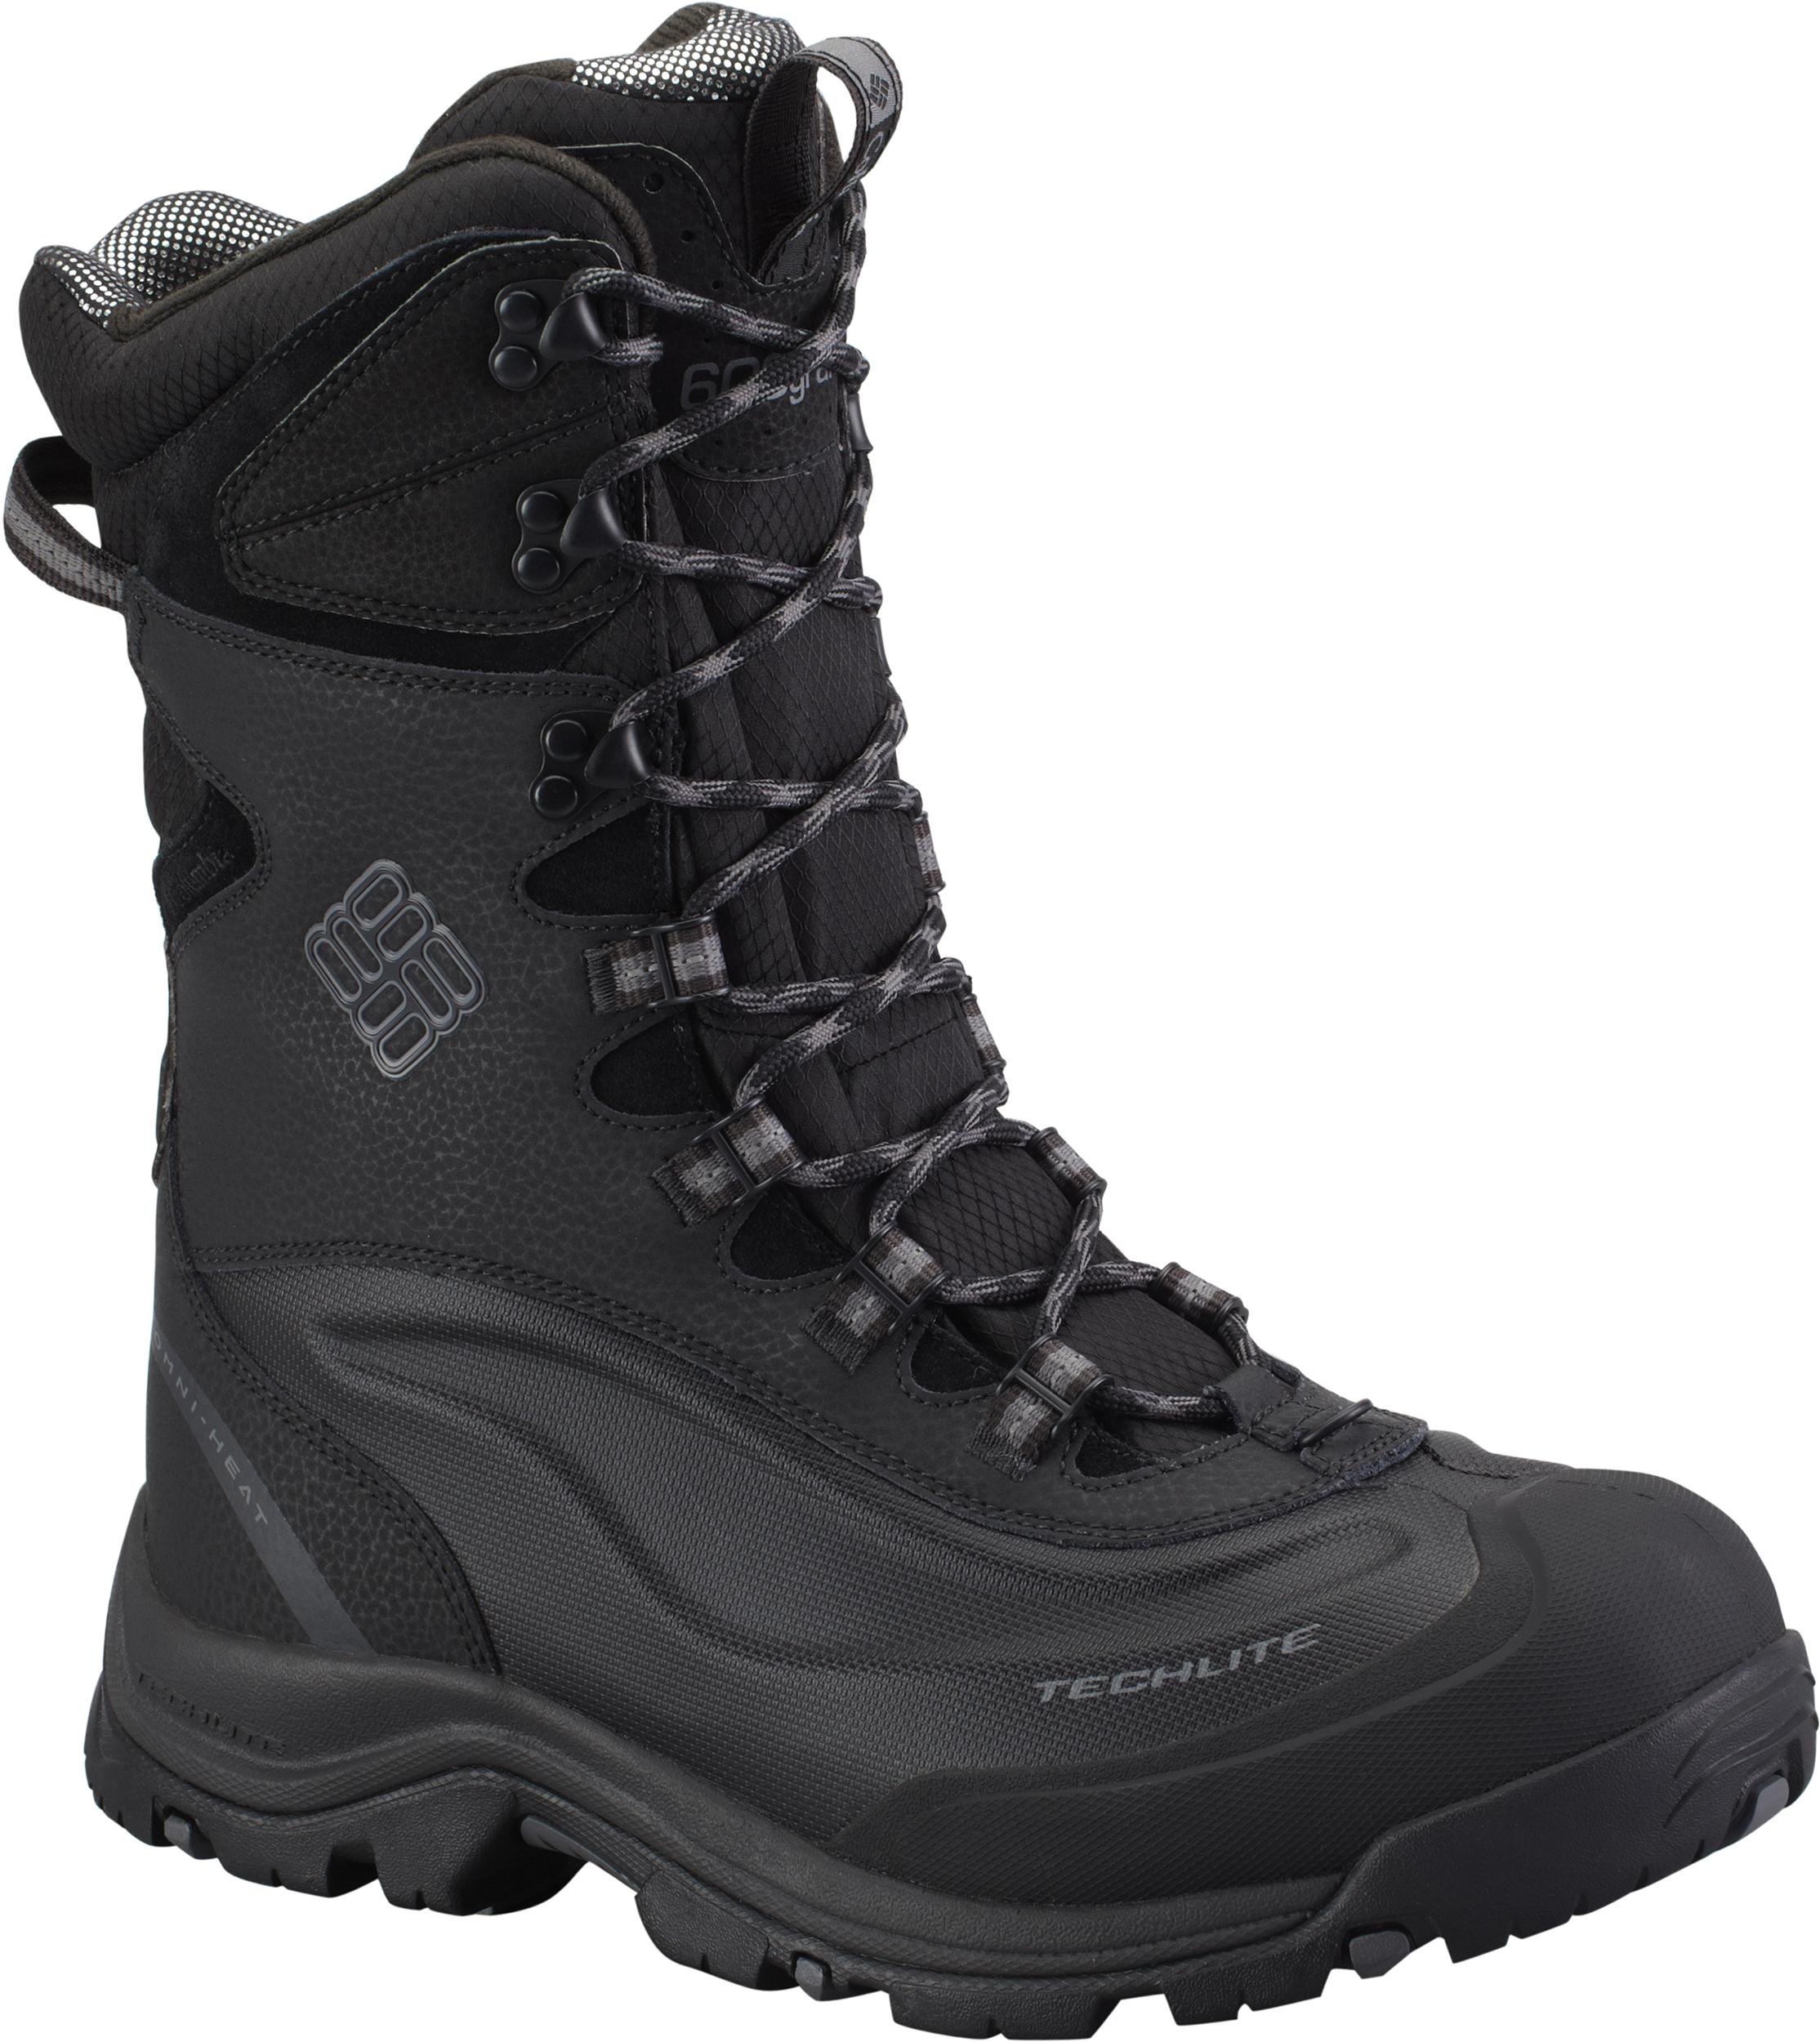 4717565d6f7 Columbia Bugaboot Plus II XTM Omni Heat Boots - Men s